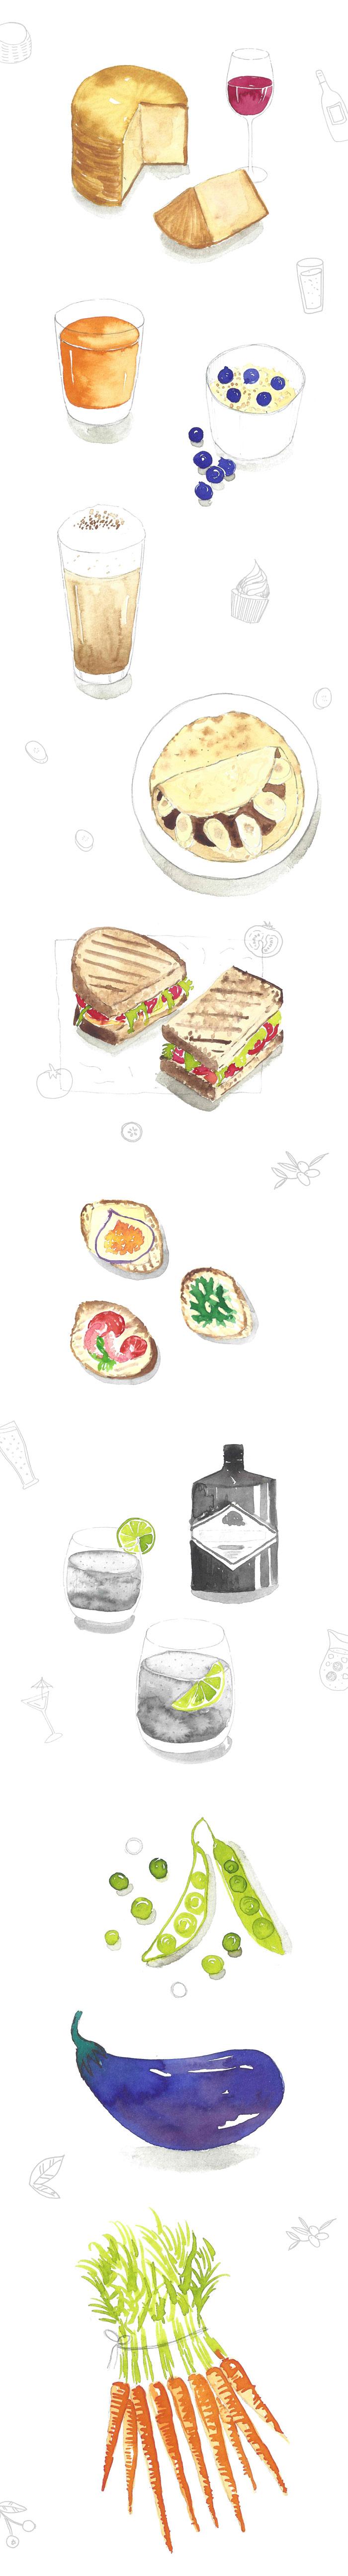 watercolor-food-drink-illustration